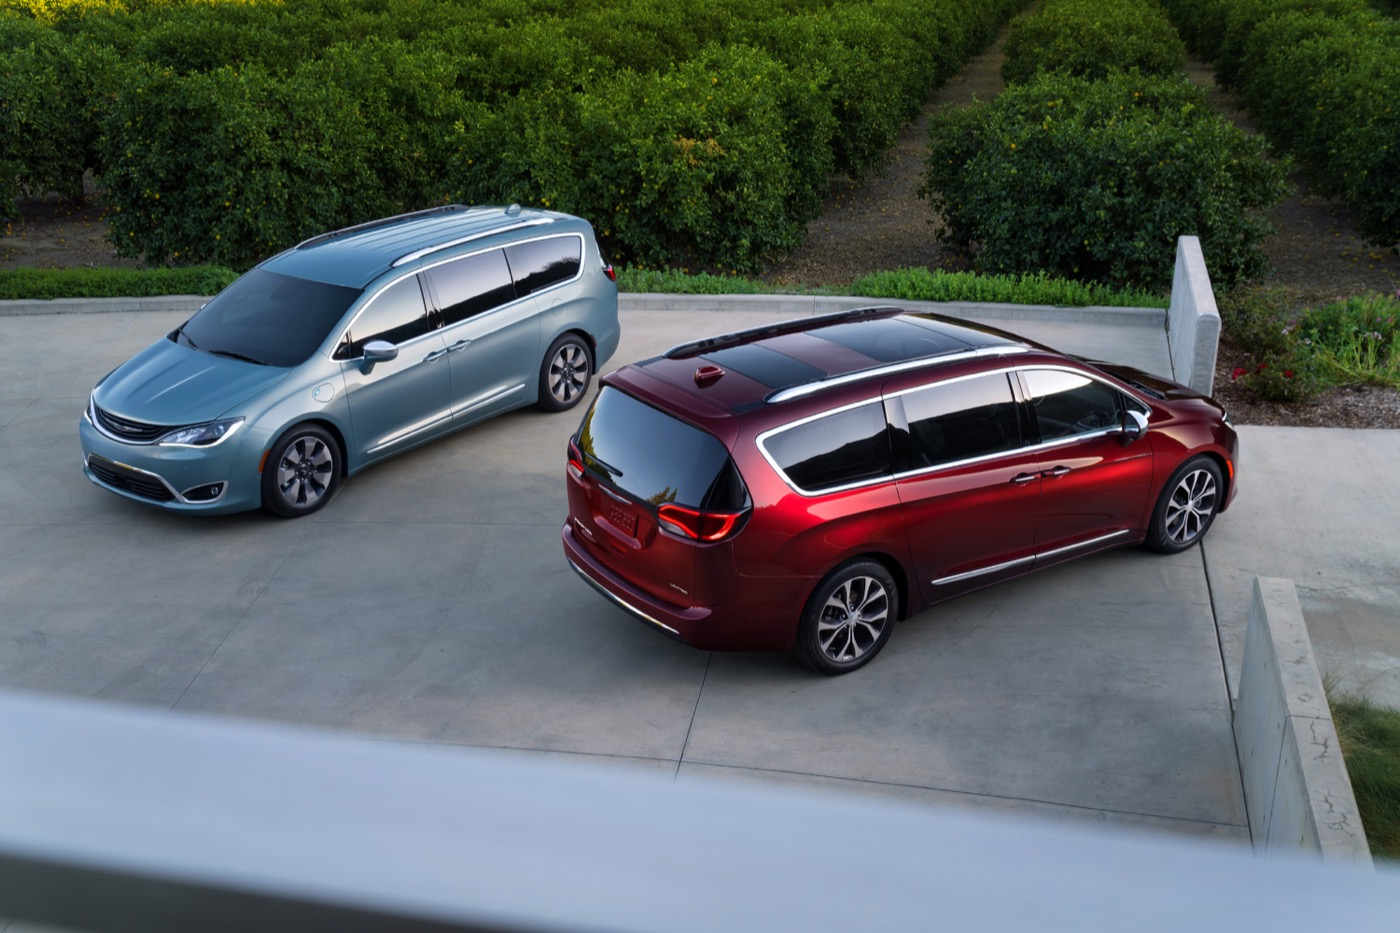 Fiat Chrysler отключил гибридное производство Pacifica на фоне отзыва безопасности: отчет